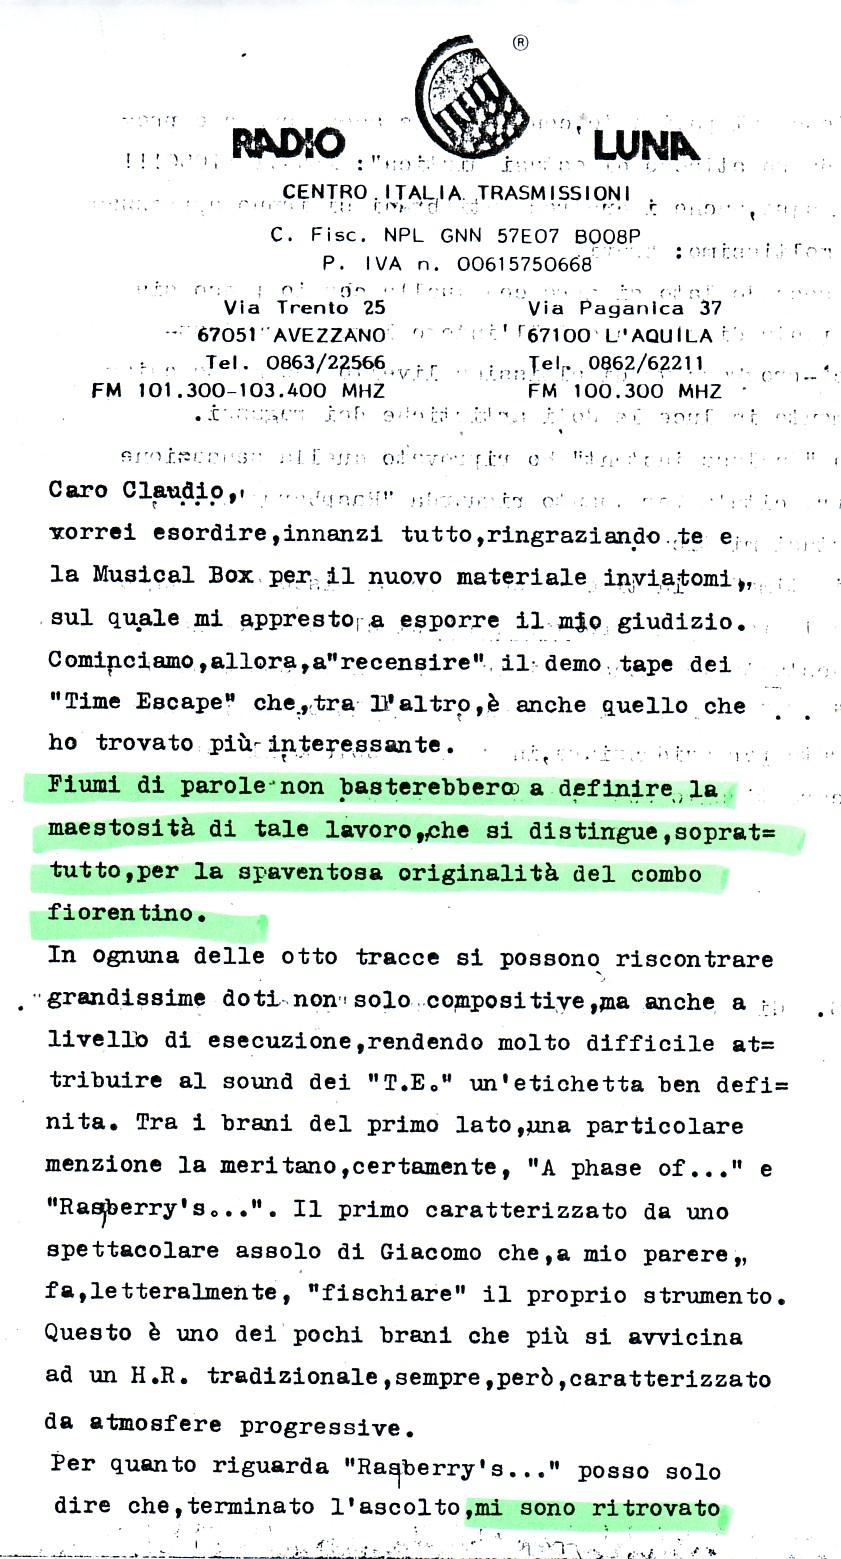 RADIO LUNA [1] (ITALY) - 1988